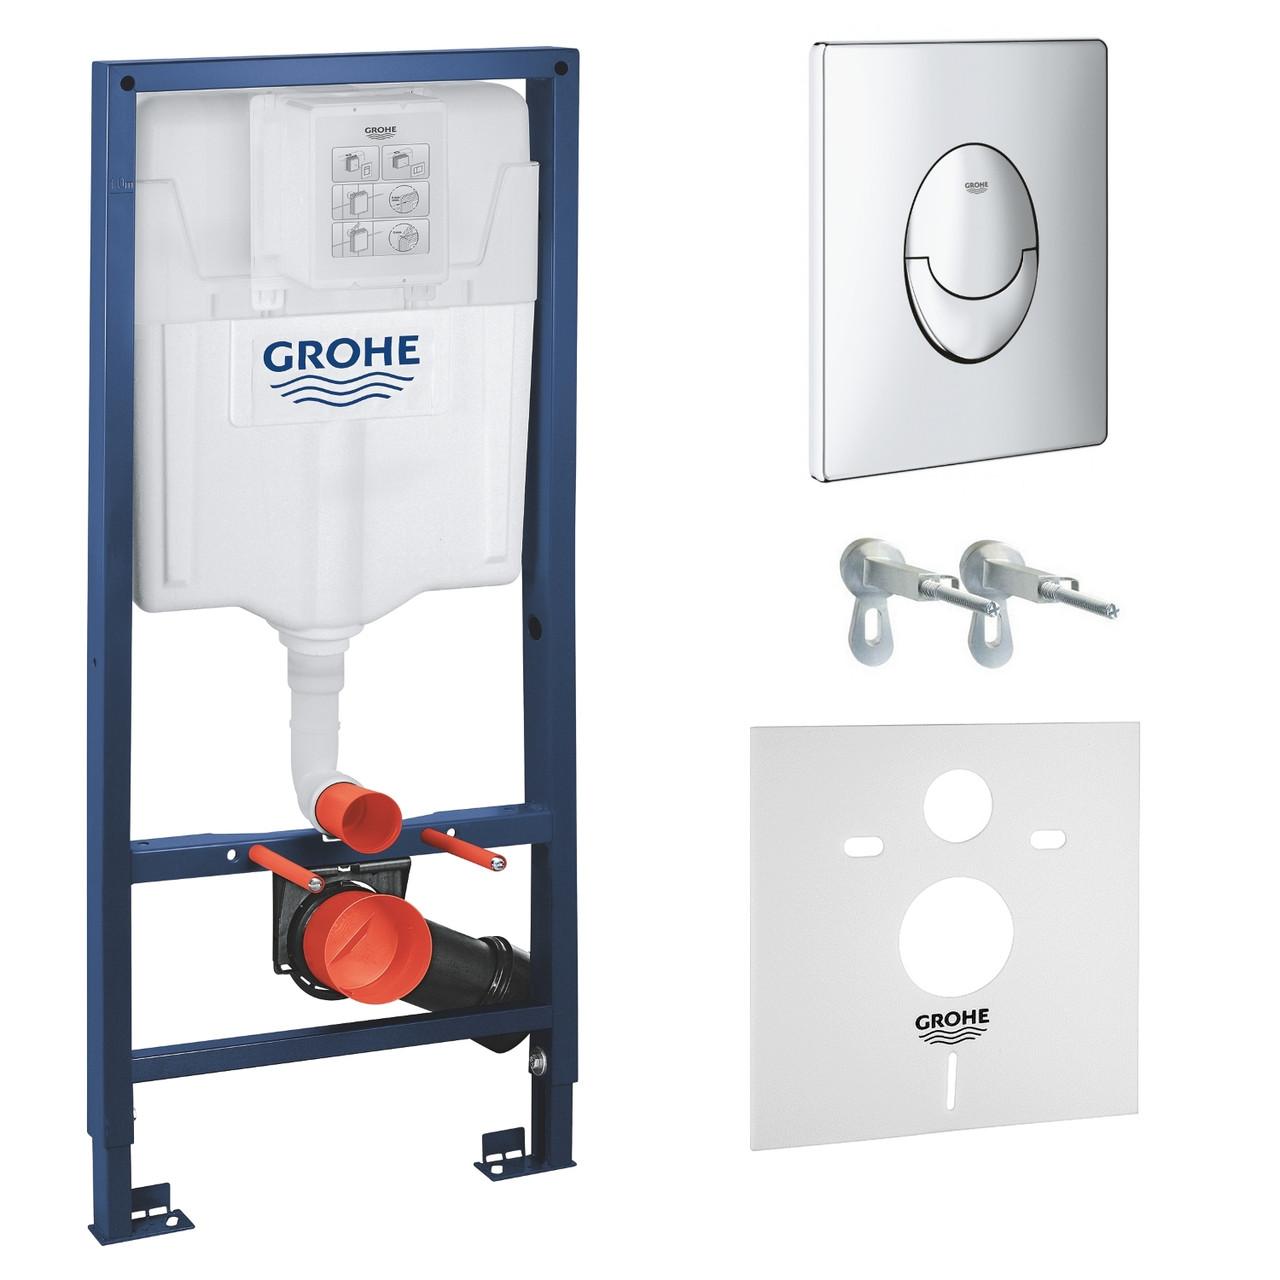 GROHE Rapid SL 4в1 комплект для подвесн унитаза (бачок, крепеж, кнопка - двойн. слив 38505000) с прокладкой